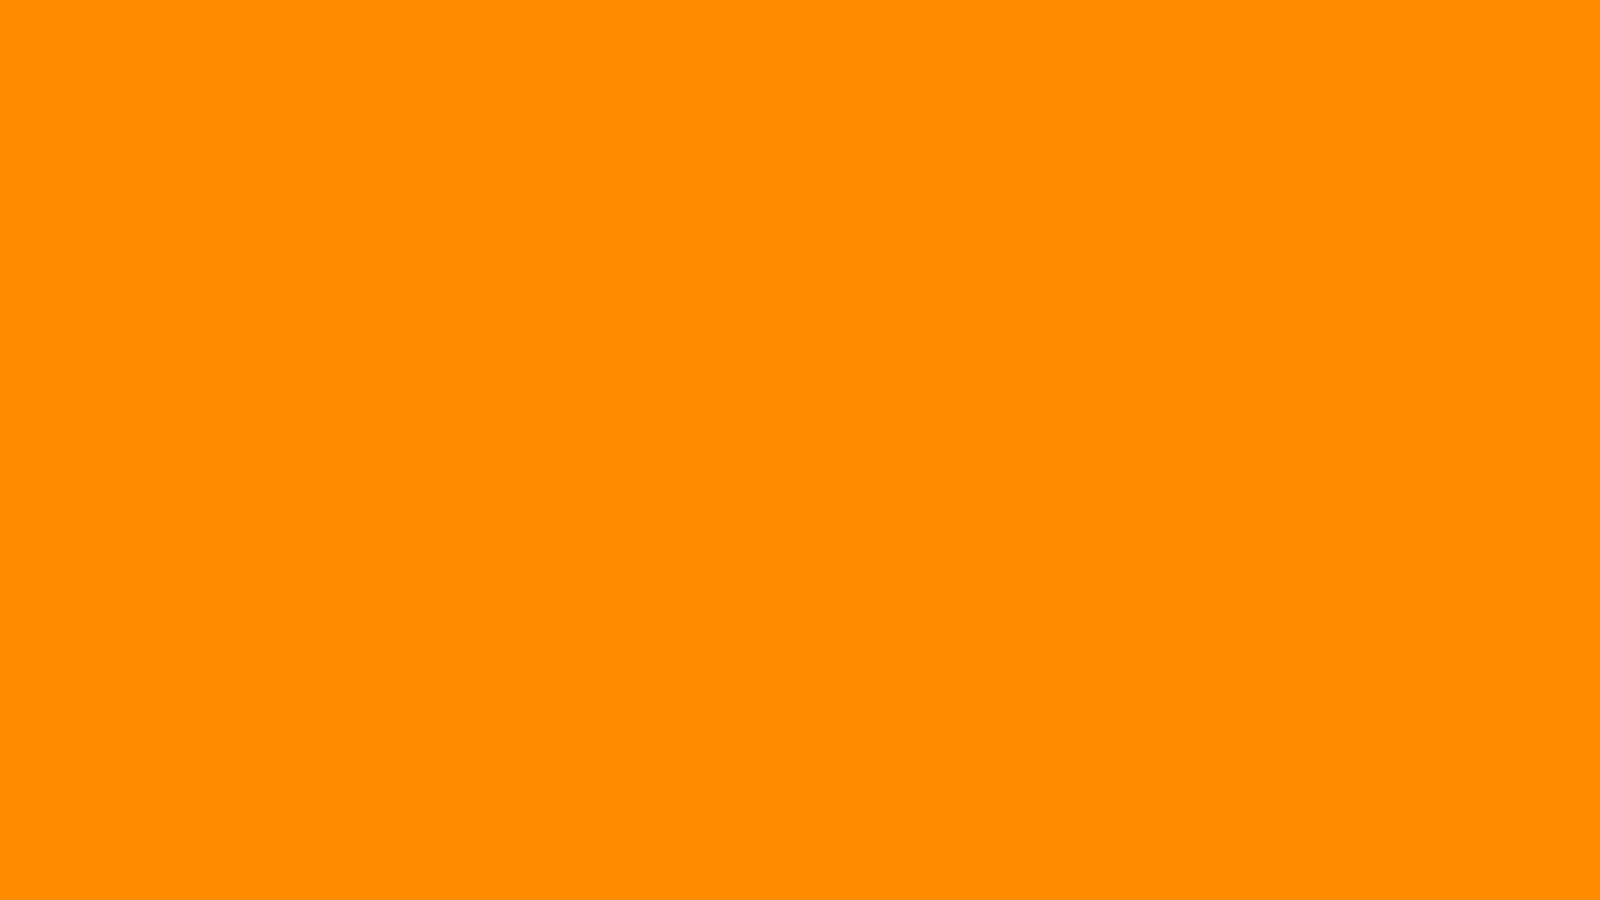 1600x900 Dark Orange Solid Color Background